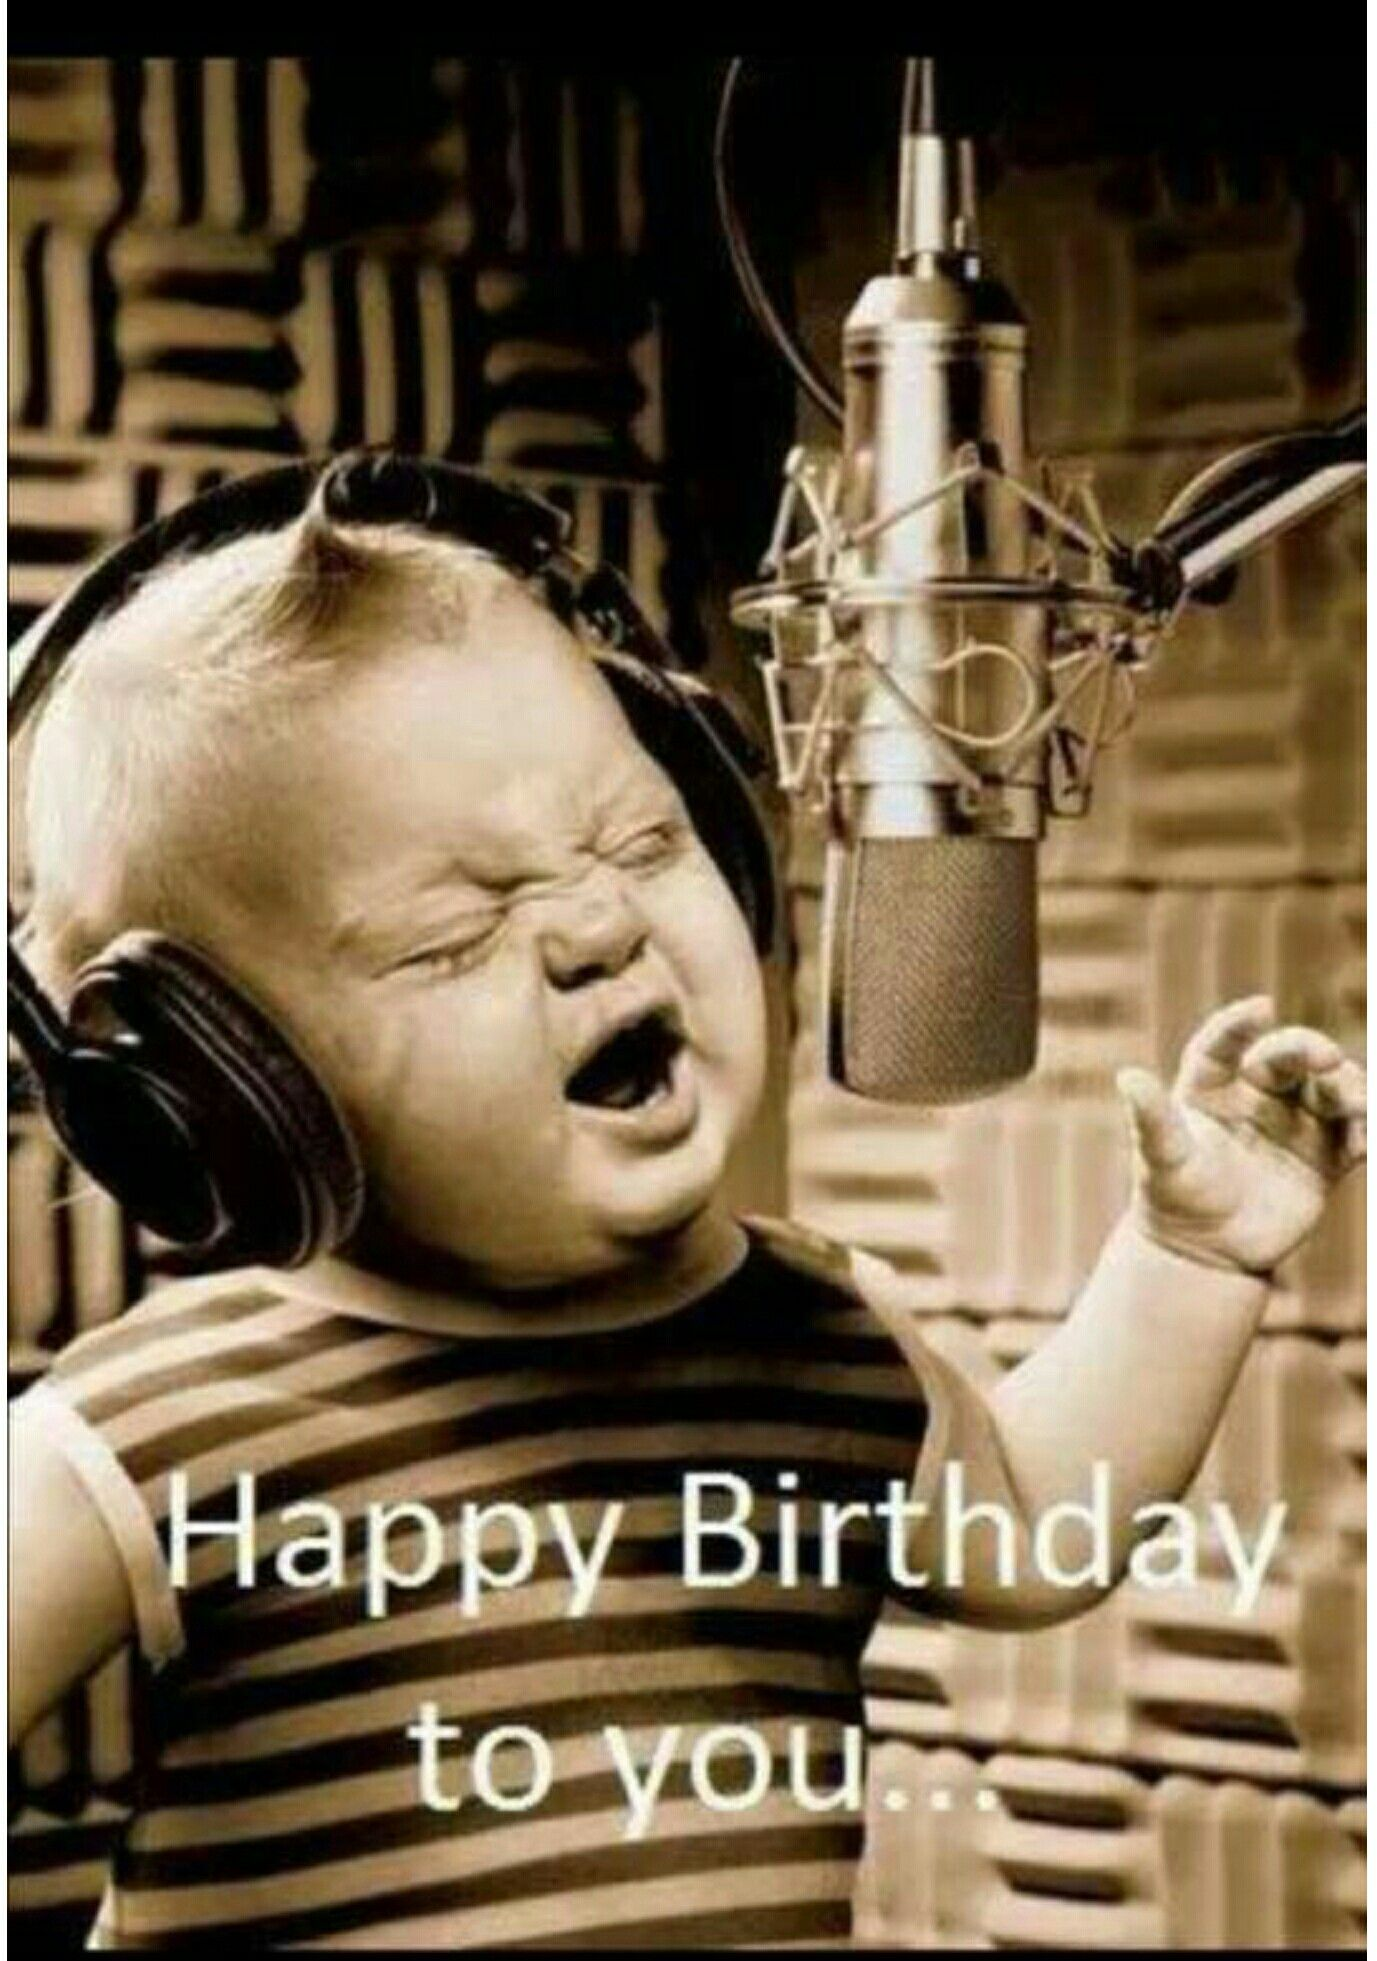 38 Singing Birthday Cards ideas | singing birthday cards